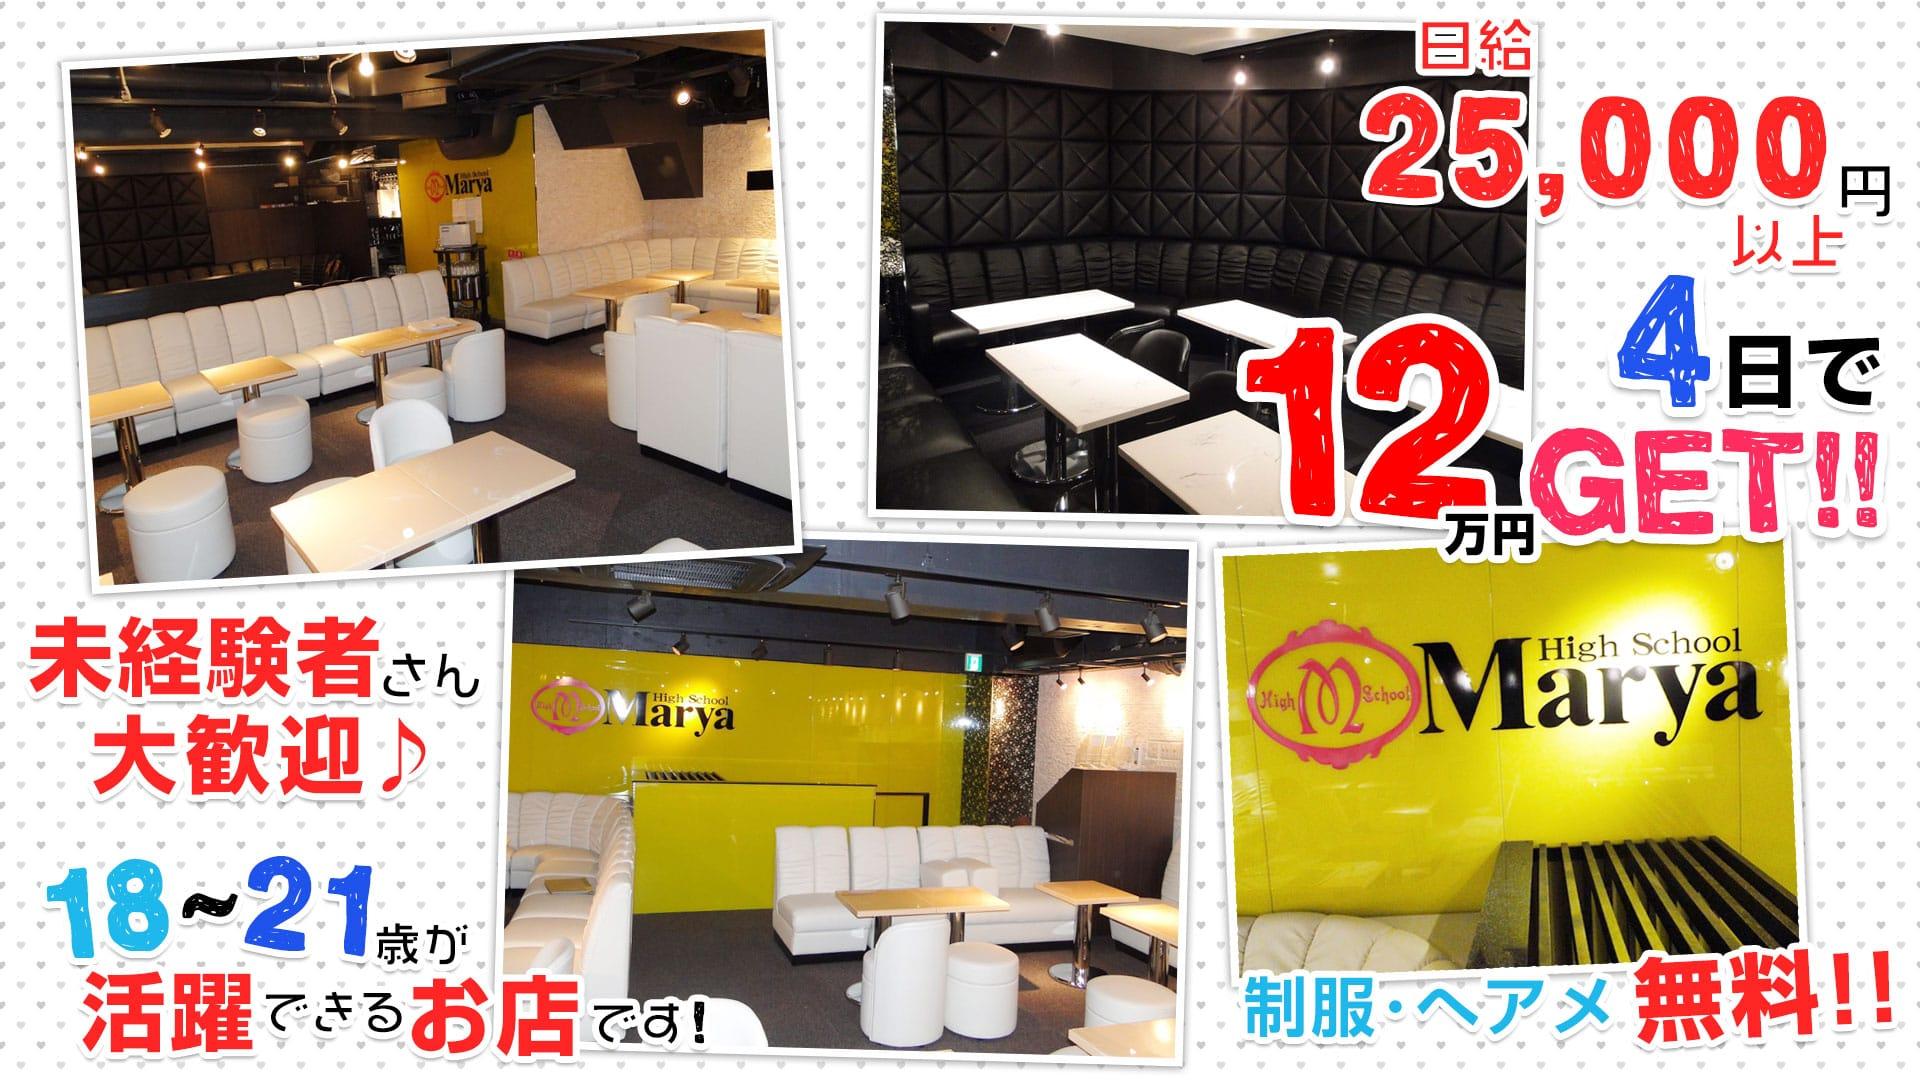 High School Marya [ハイスクール マーヤ]池袋店 TOP画像